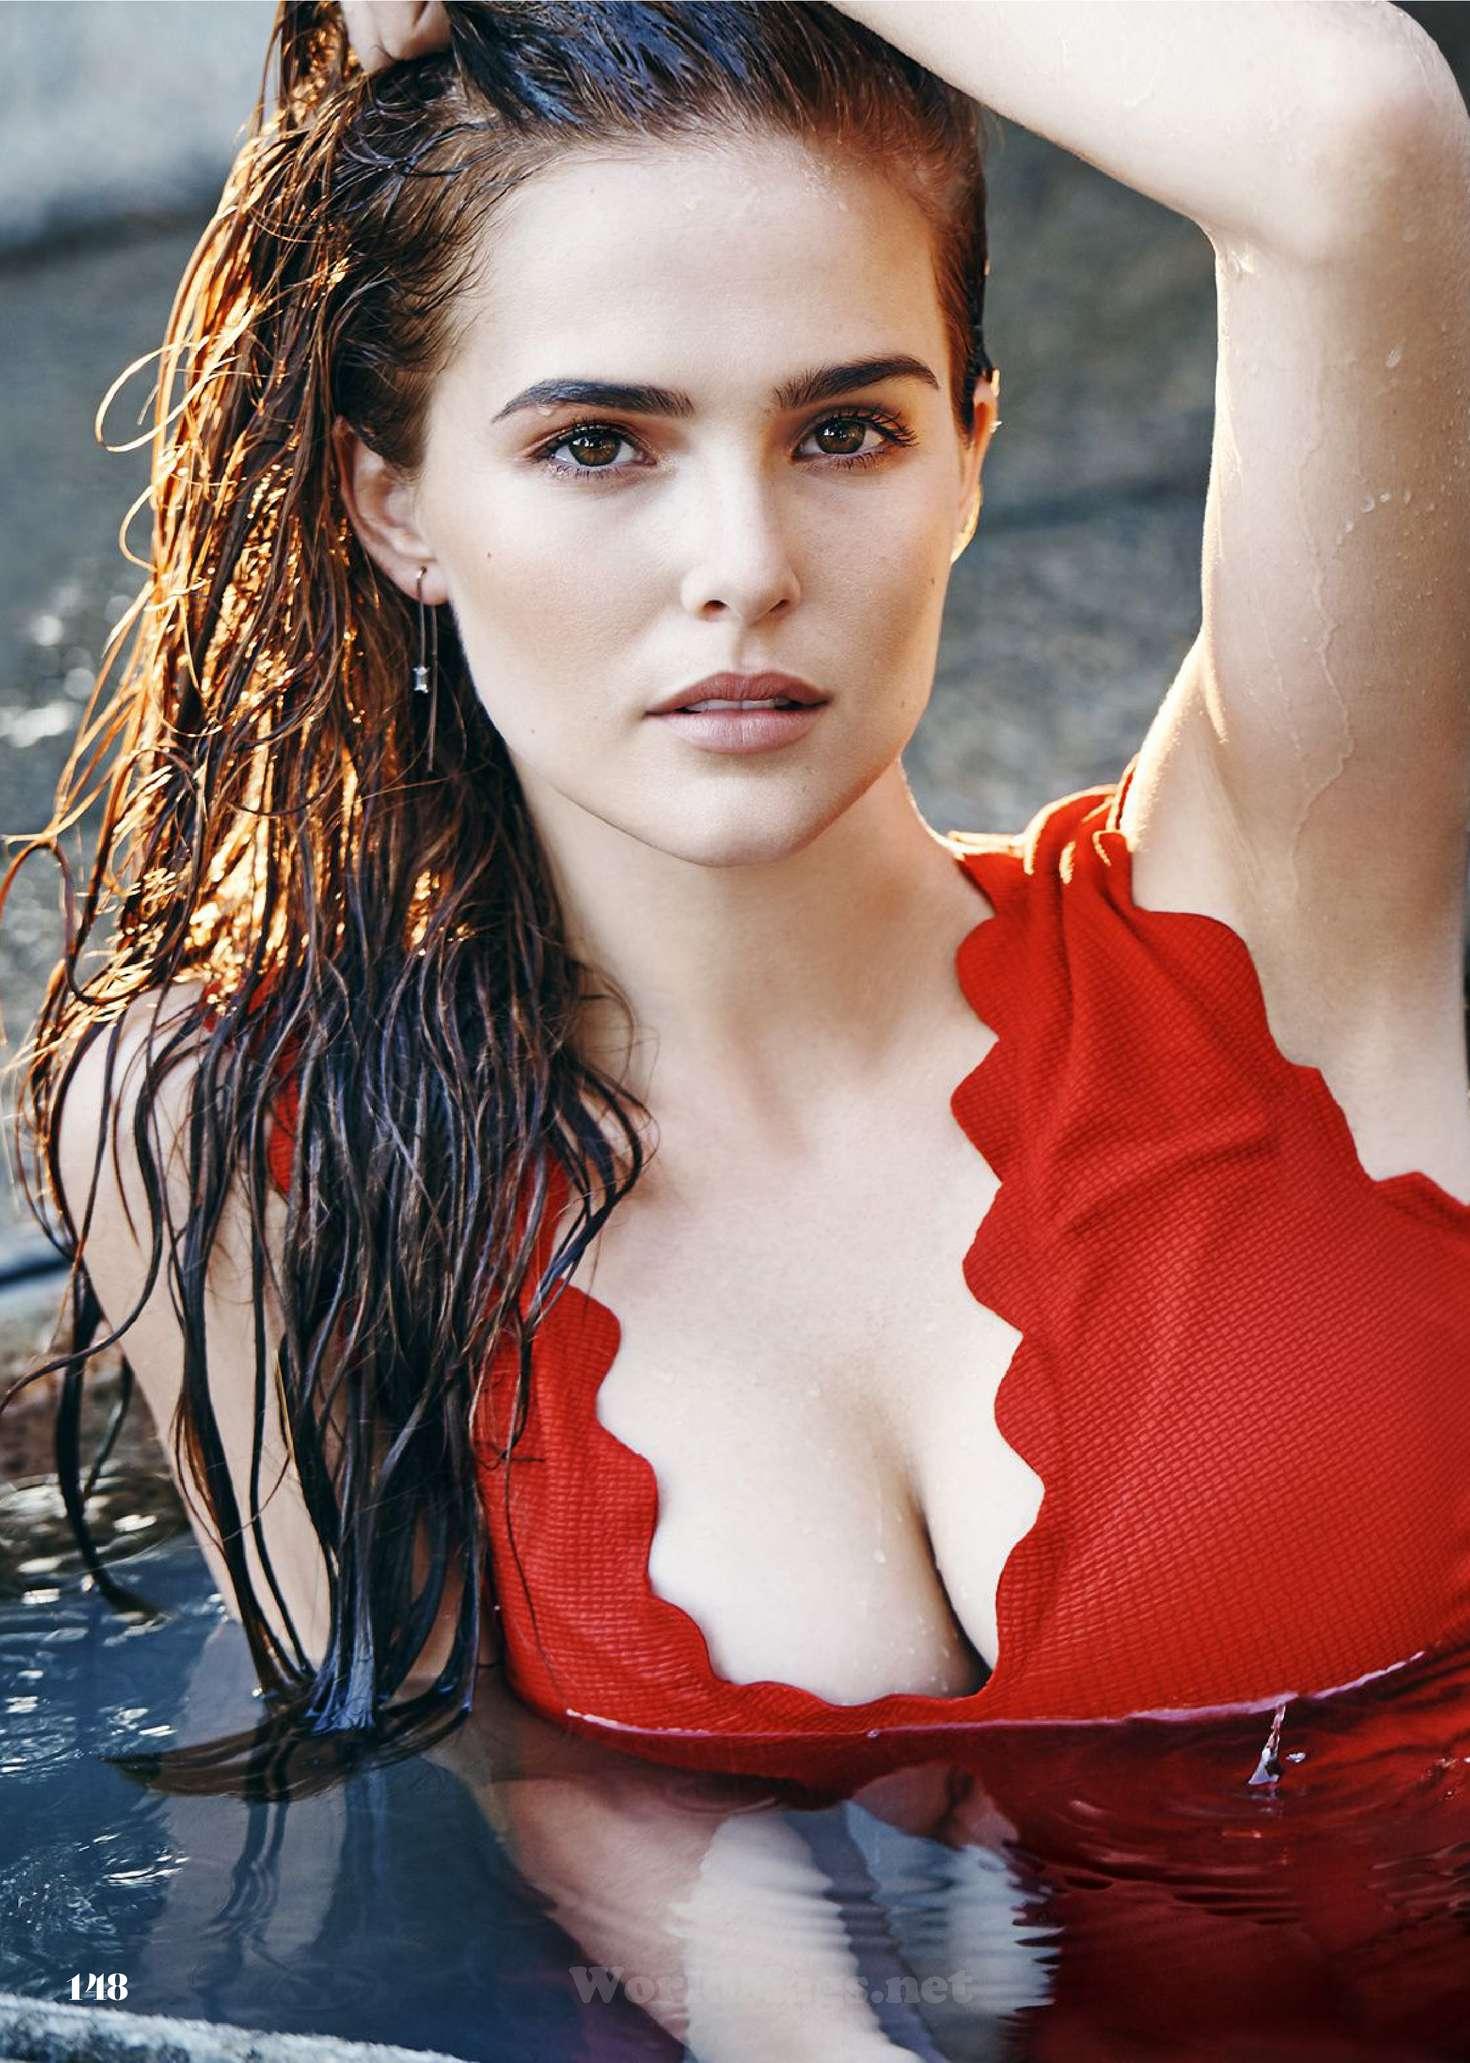 Zoey Deutch - Cosmopolitan Magazine (February 2016)